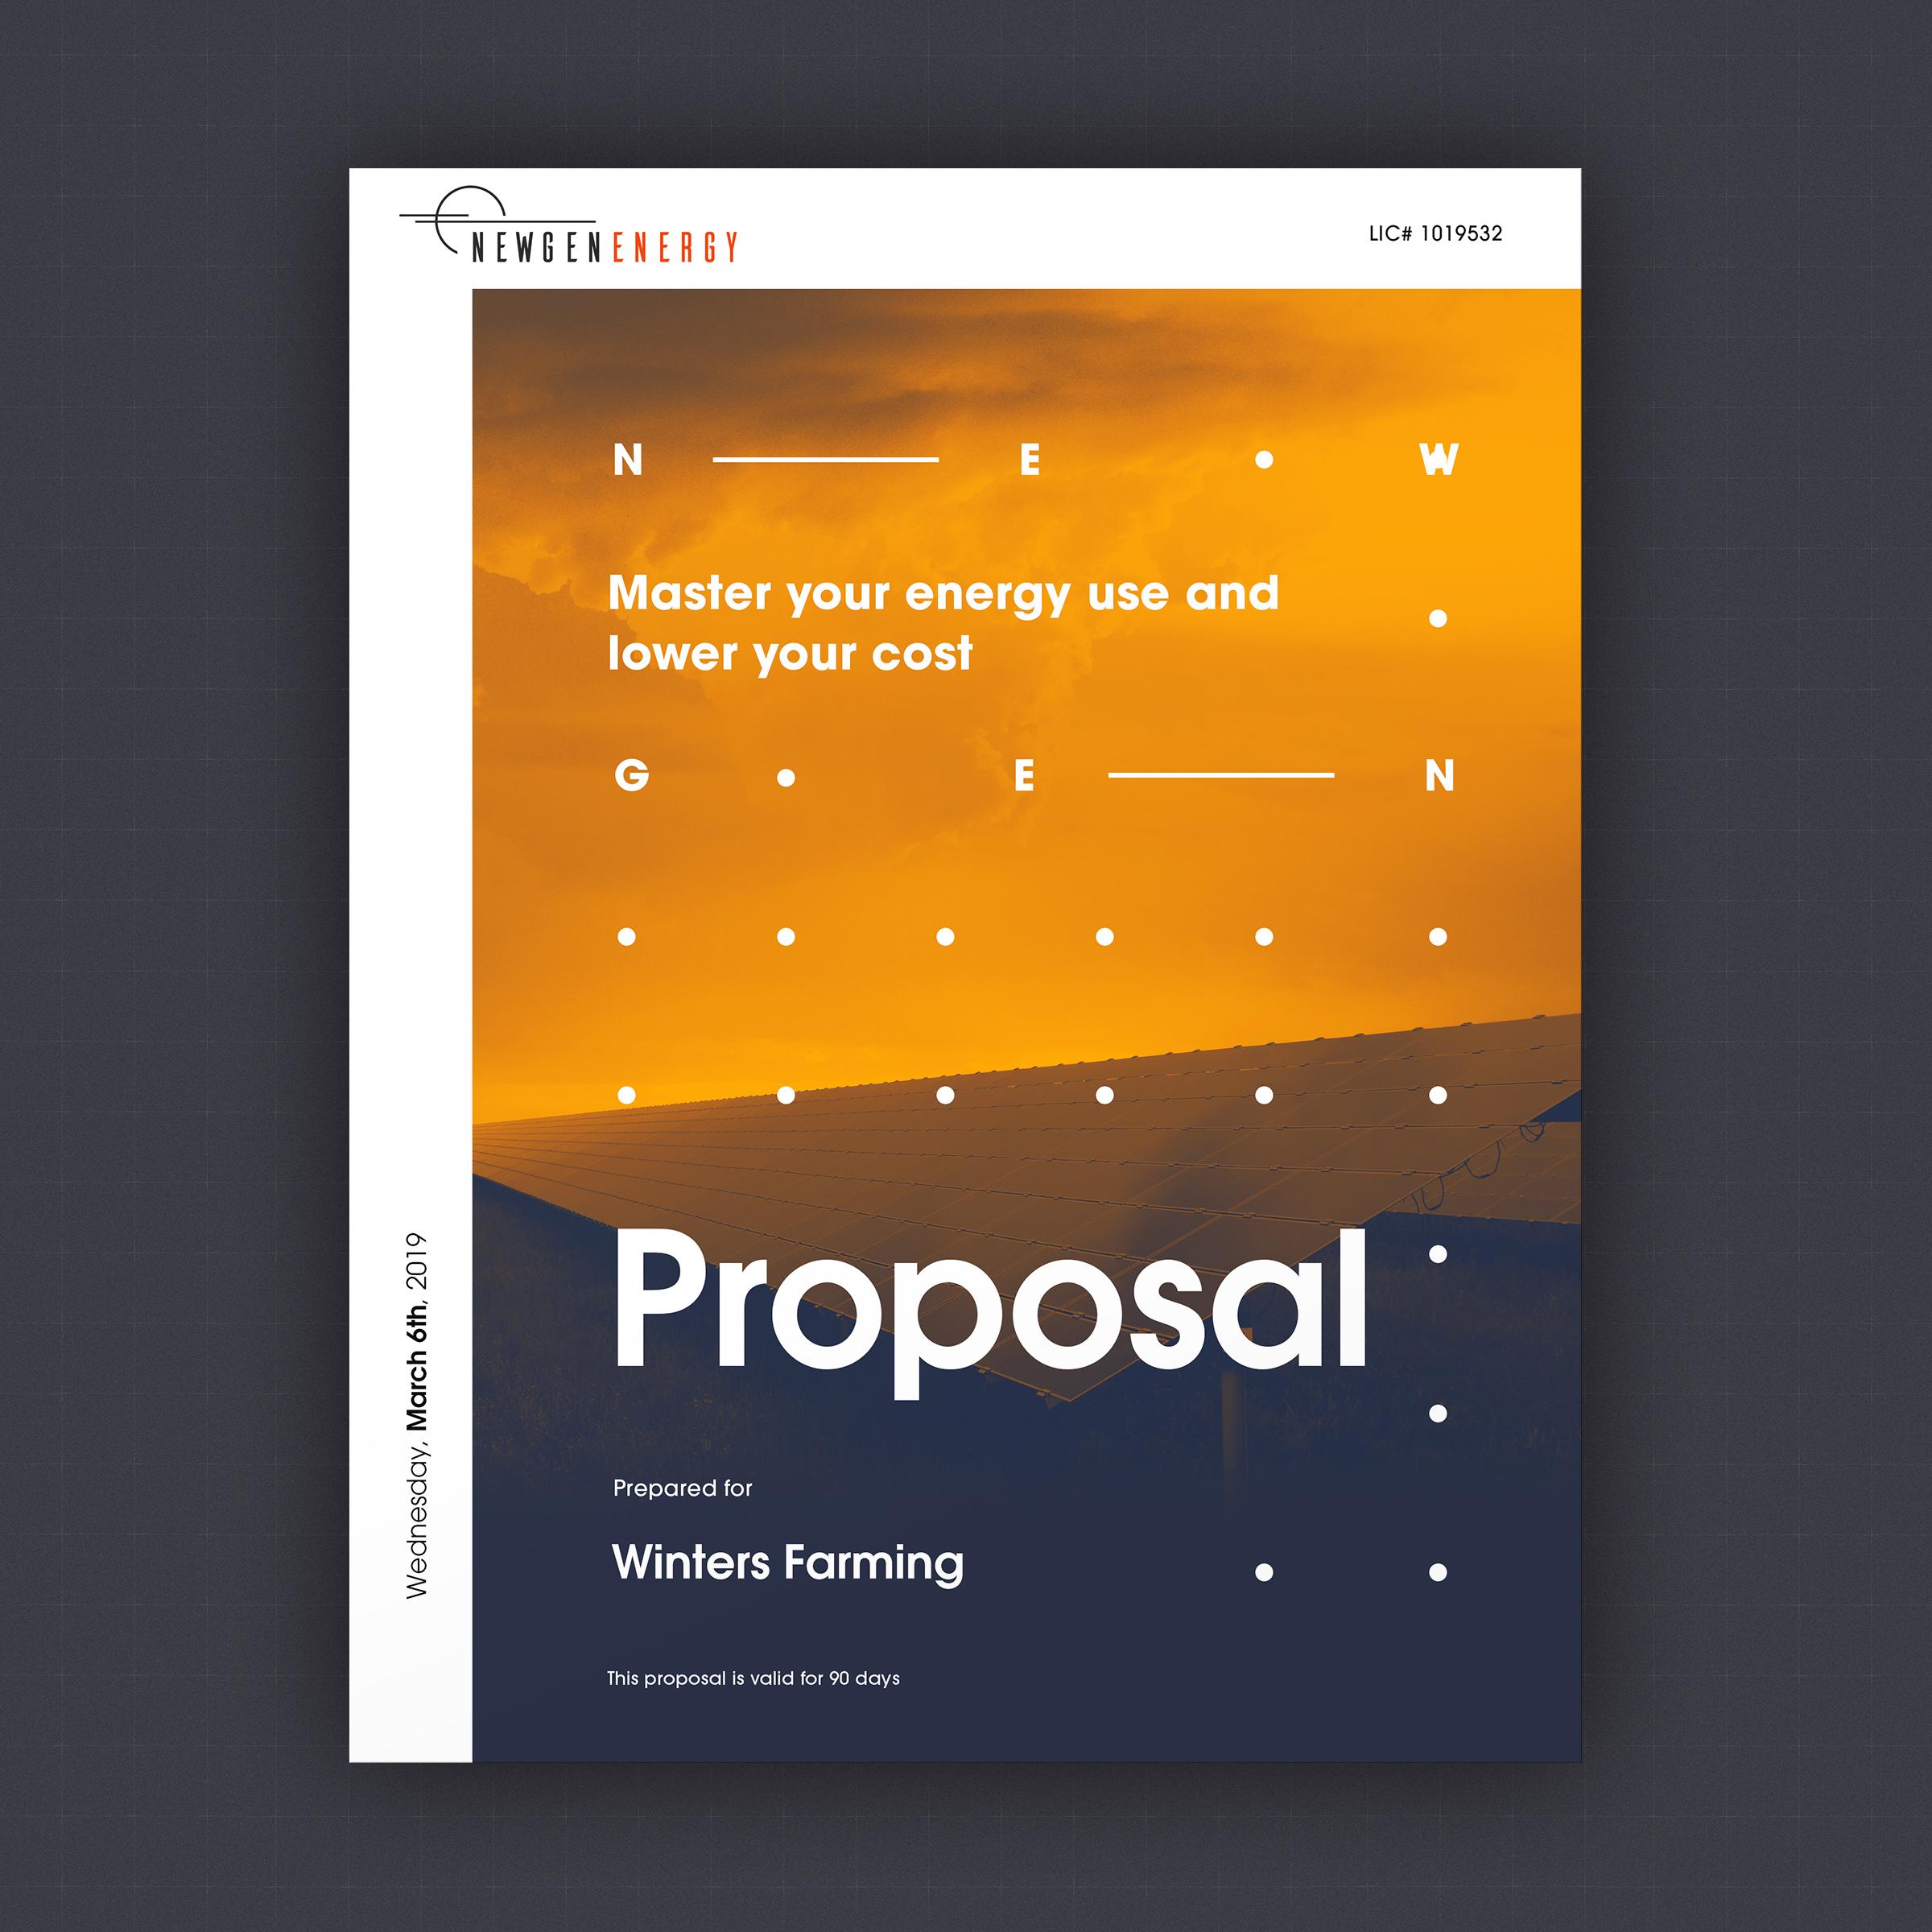 3-NewGen Proposal-Cover Opt. 3.jpg